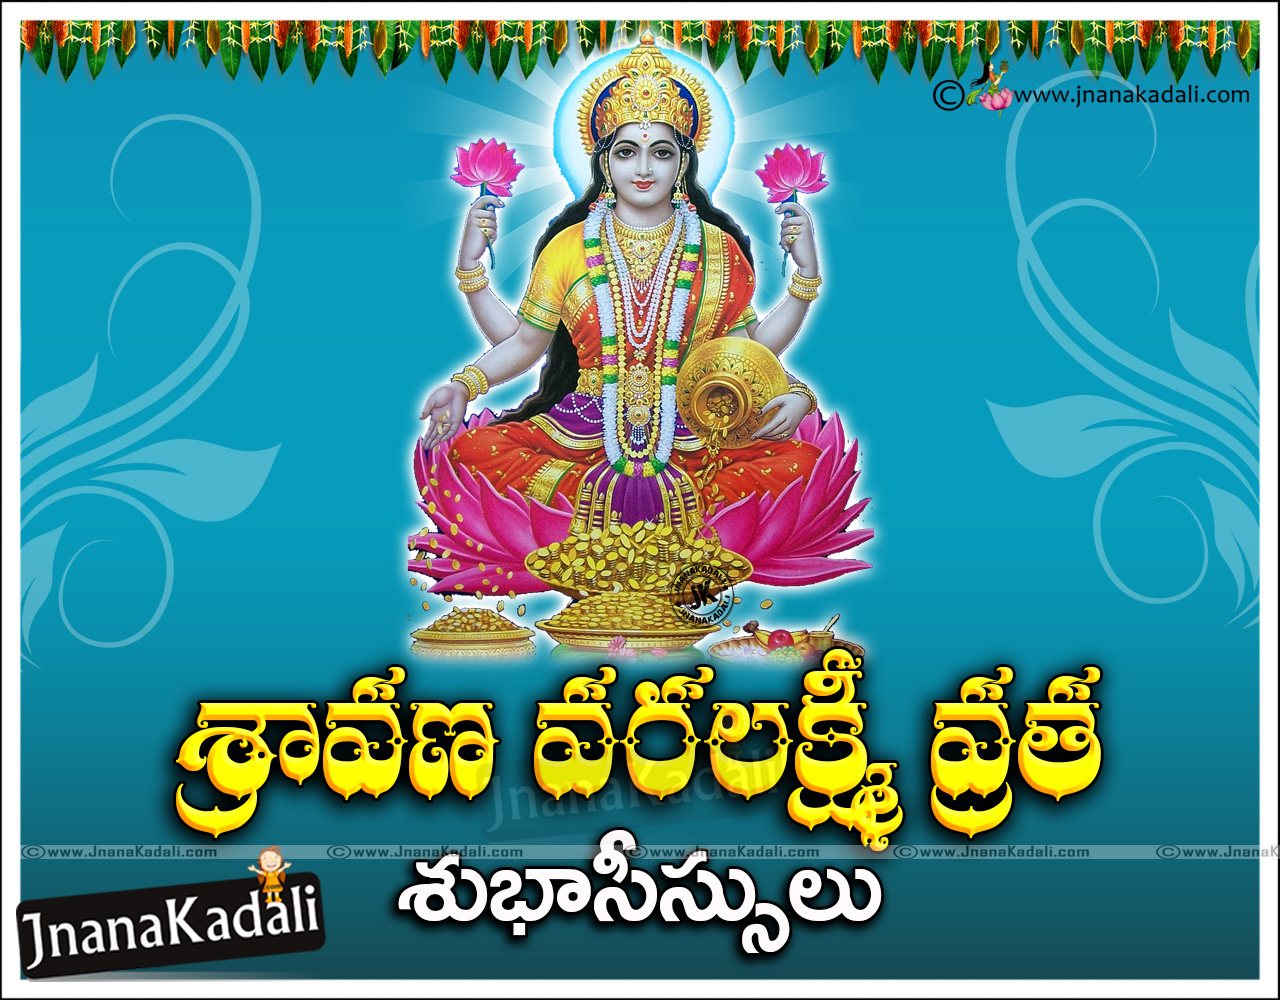 Heres Is Latest Goddess Varalakshmi Hd Wallpapers With Varalakshmi Vratam  Wishes In Telugu Language Varalakshmi Vratam - Varalakshmi Vratham PNG